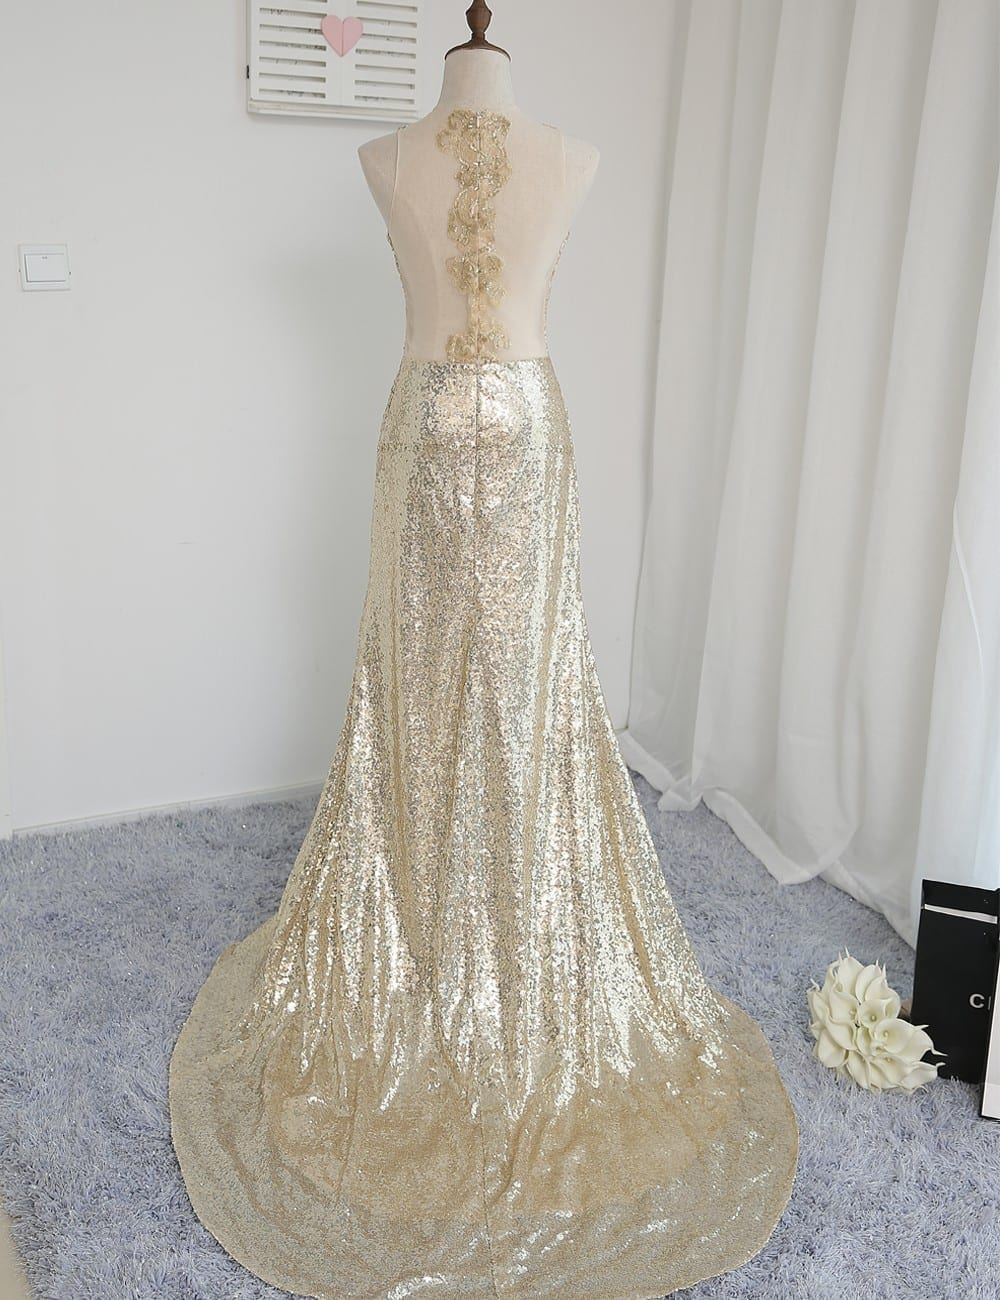 High Collar See Through Champagne Sequins Slit Mermaid Bridesmaid Dress